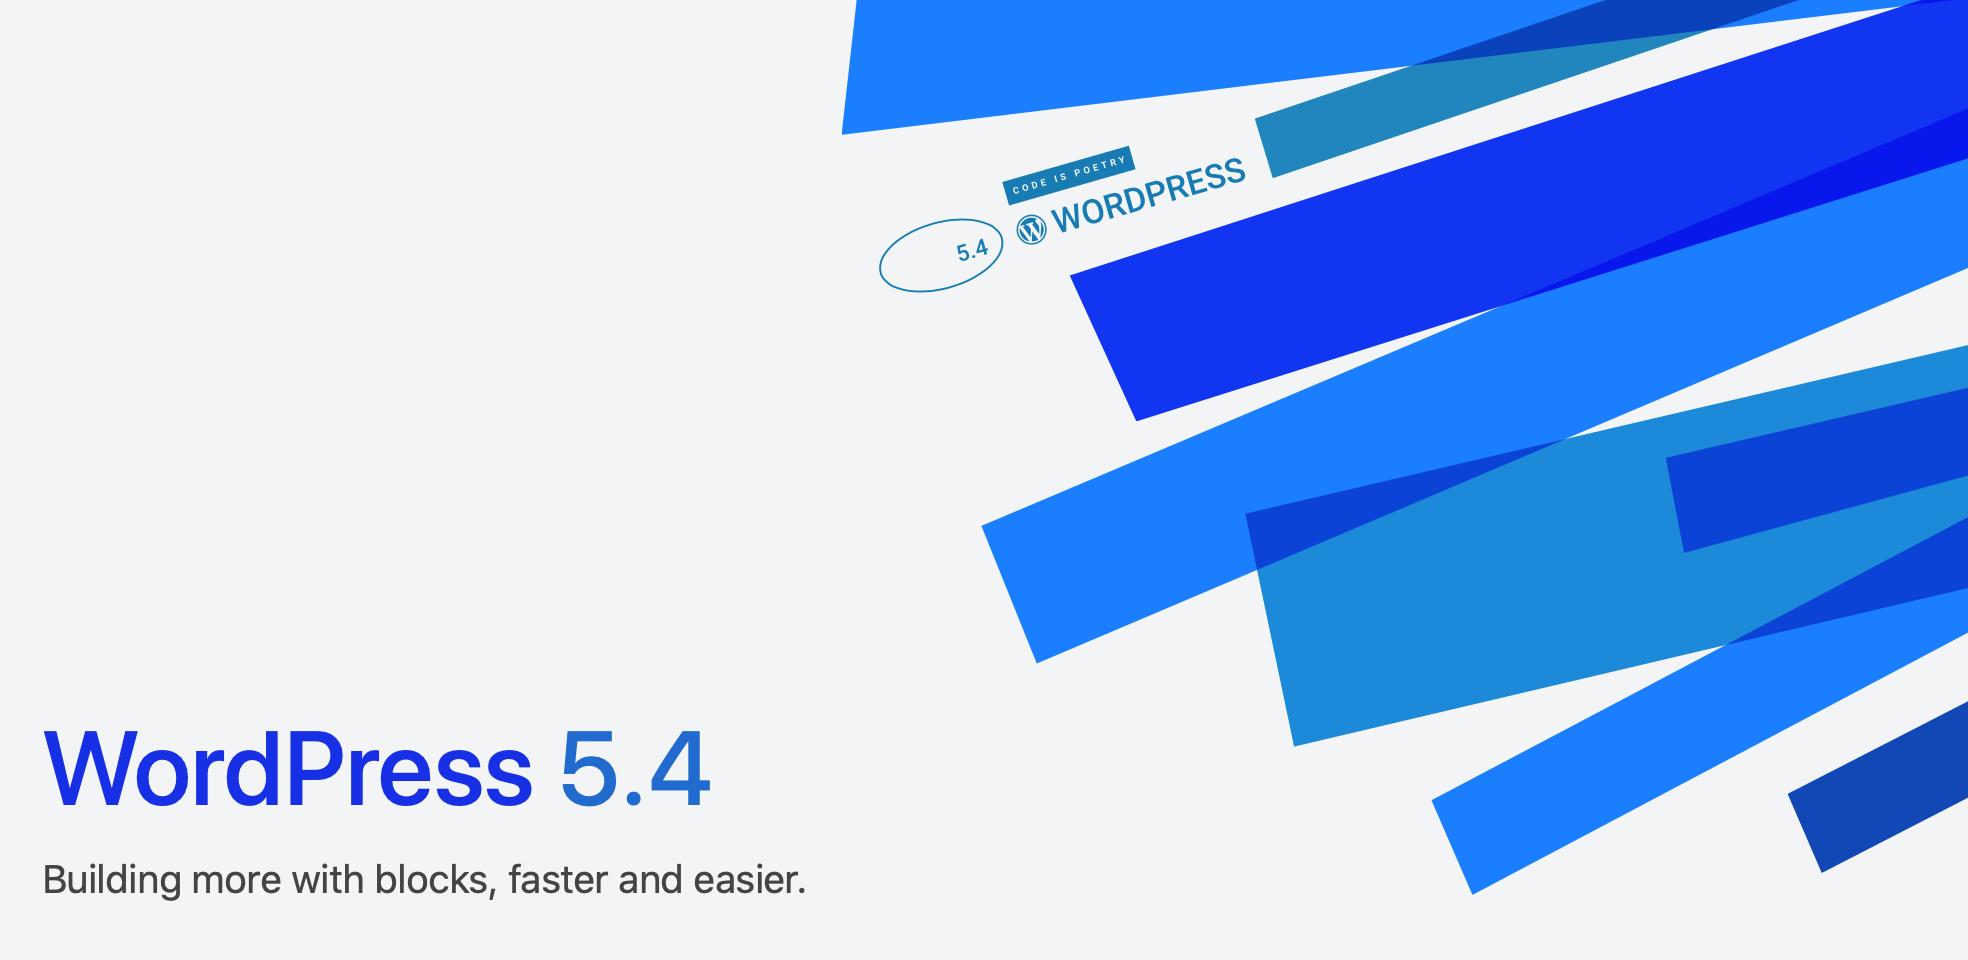 wordpress 5.5 ダウングレード